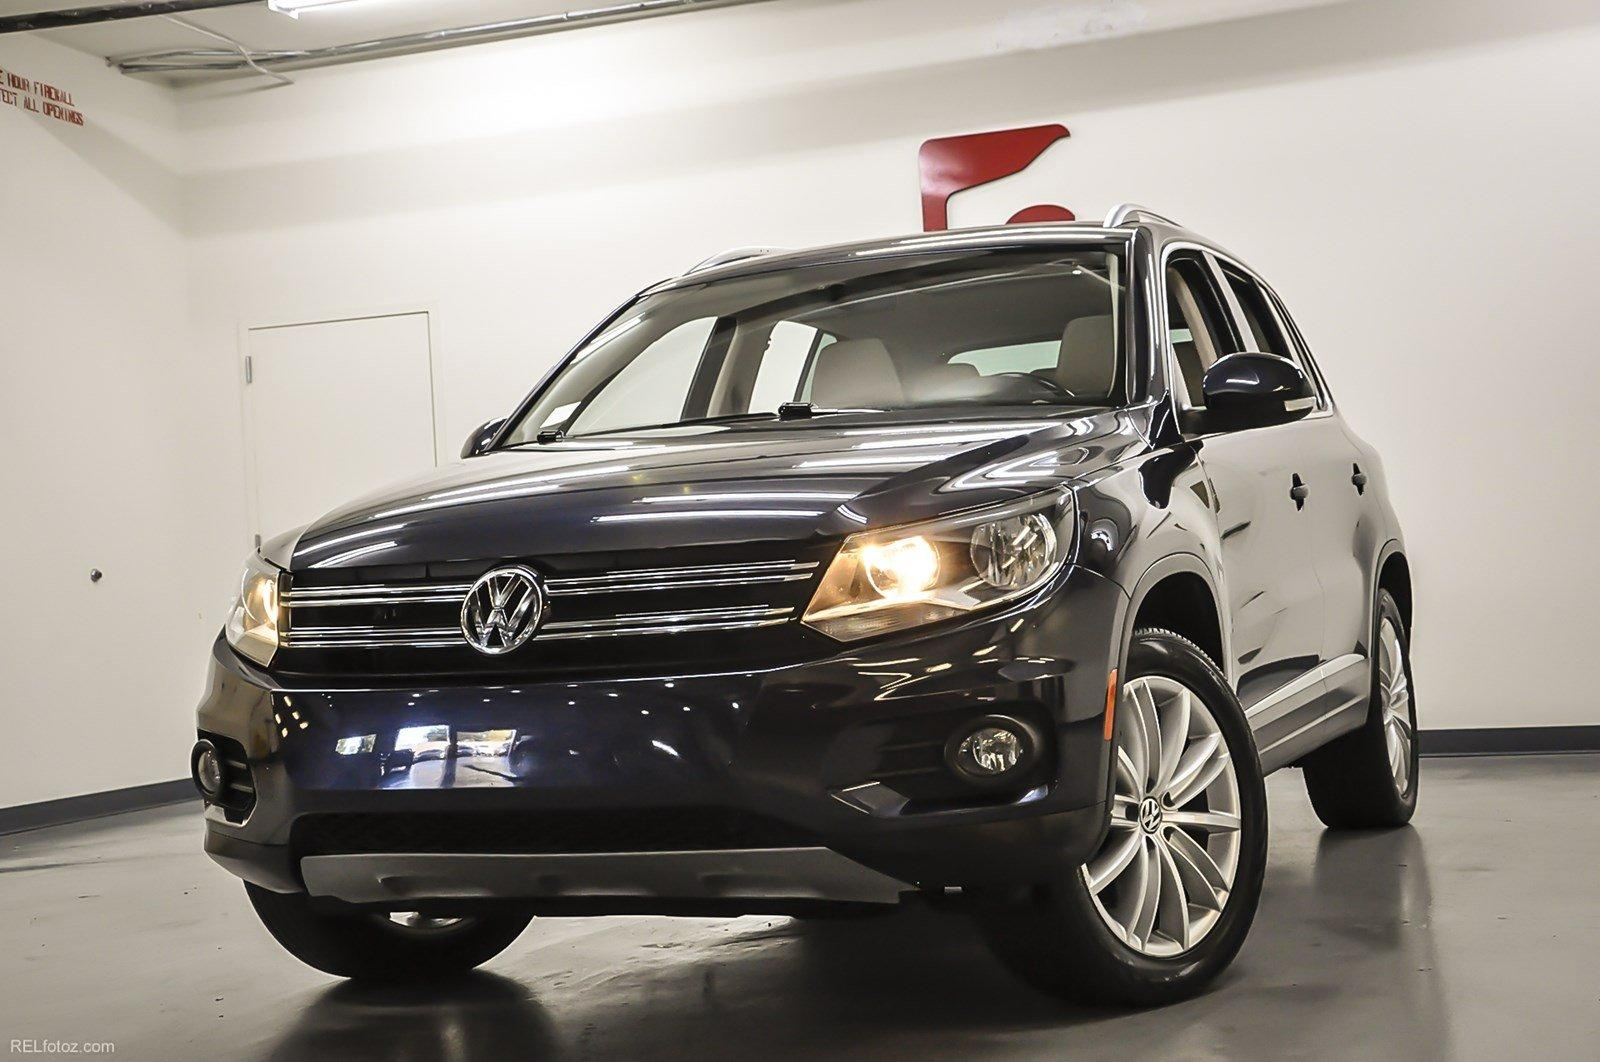 2012 Volkswagen Tiguan S Stock 562132 For Sale Near